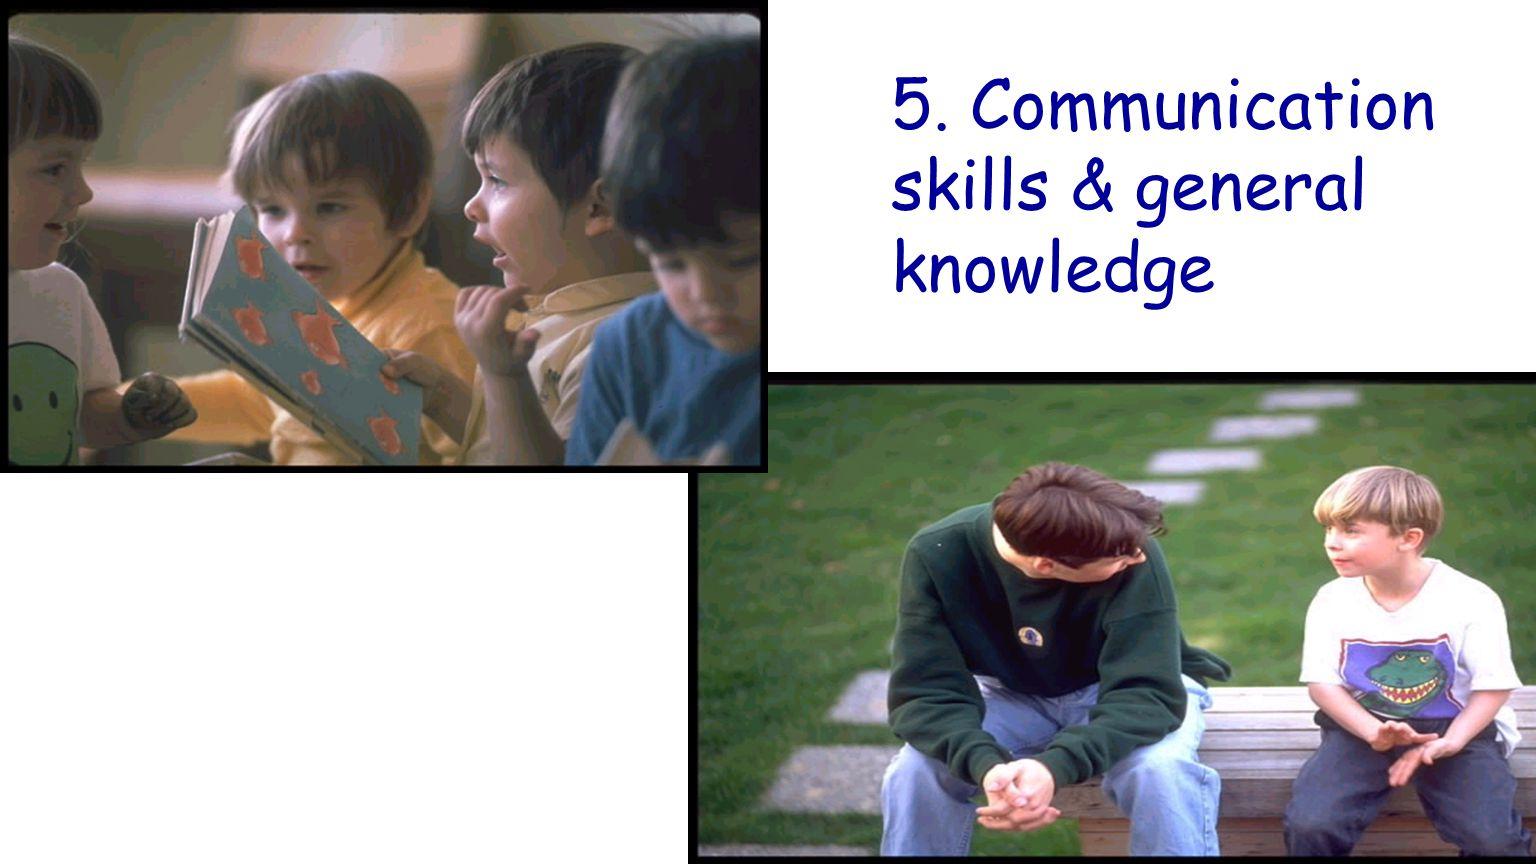 5. Communication skills & general knowledge